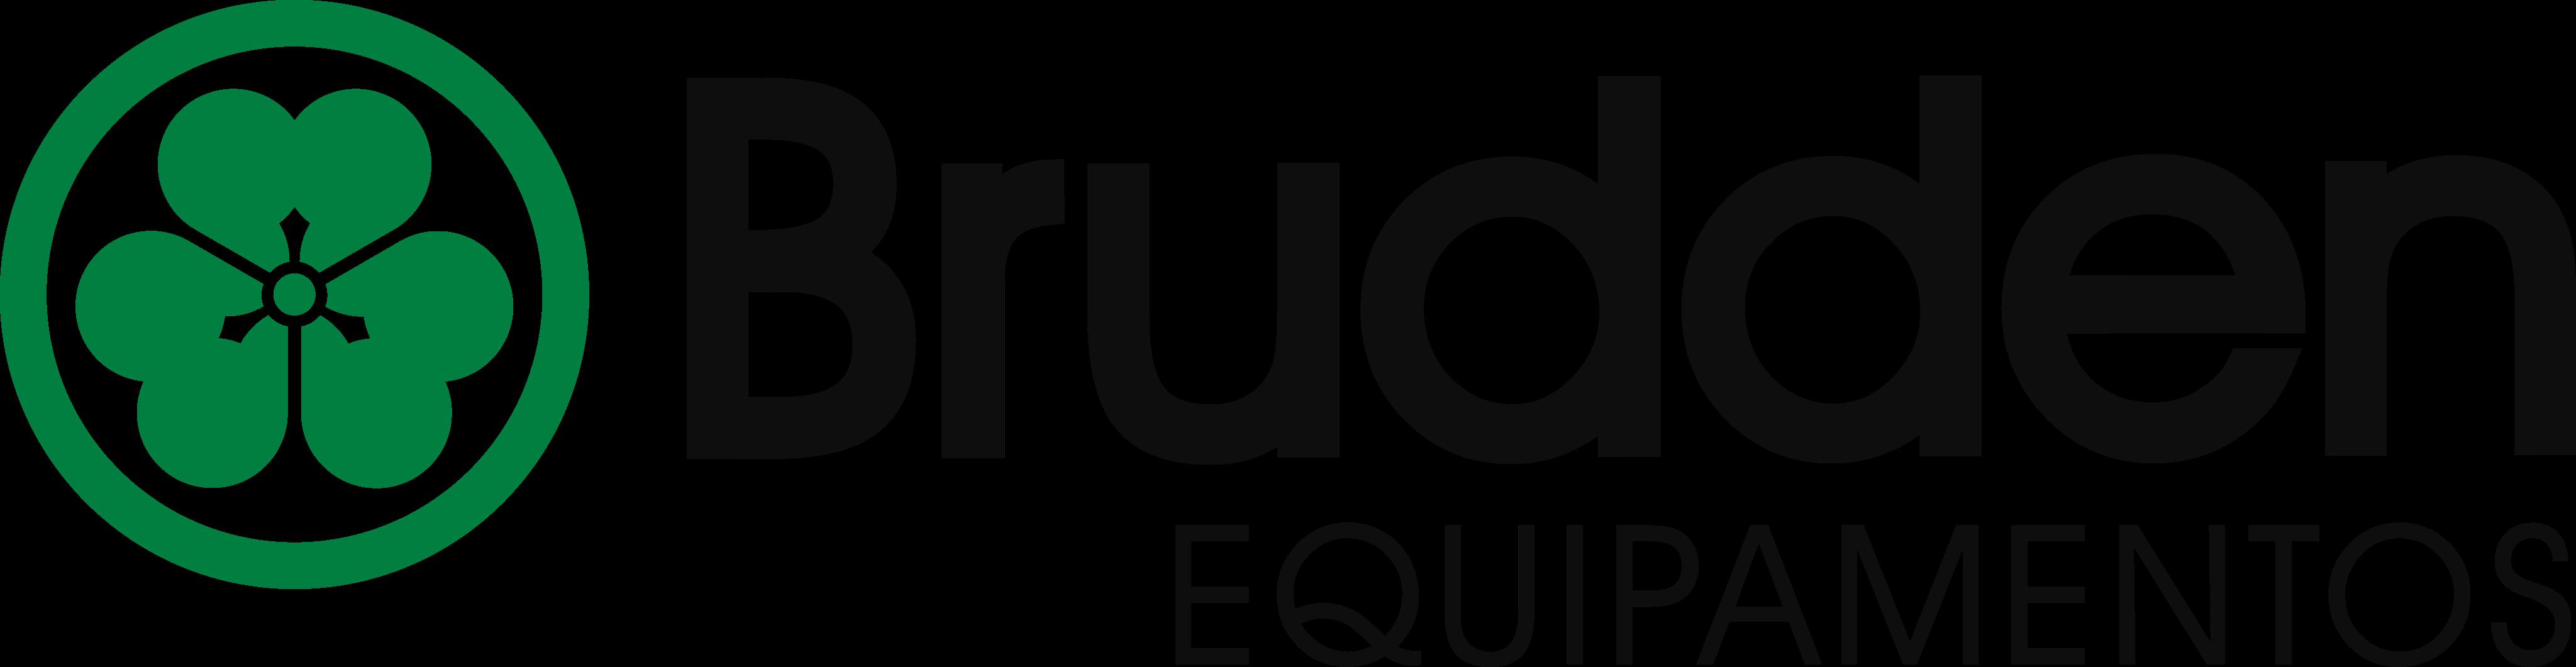 Brudden Logo.